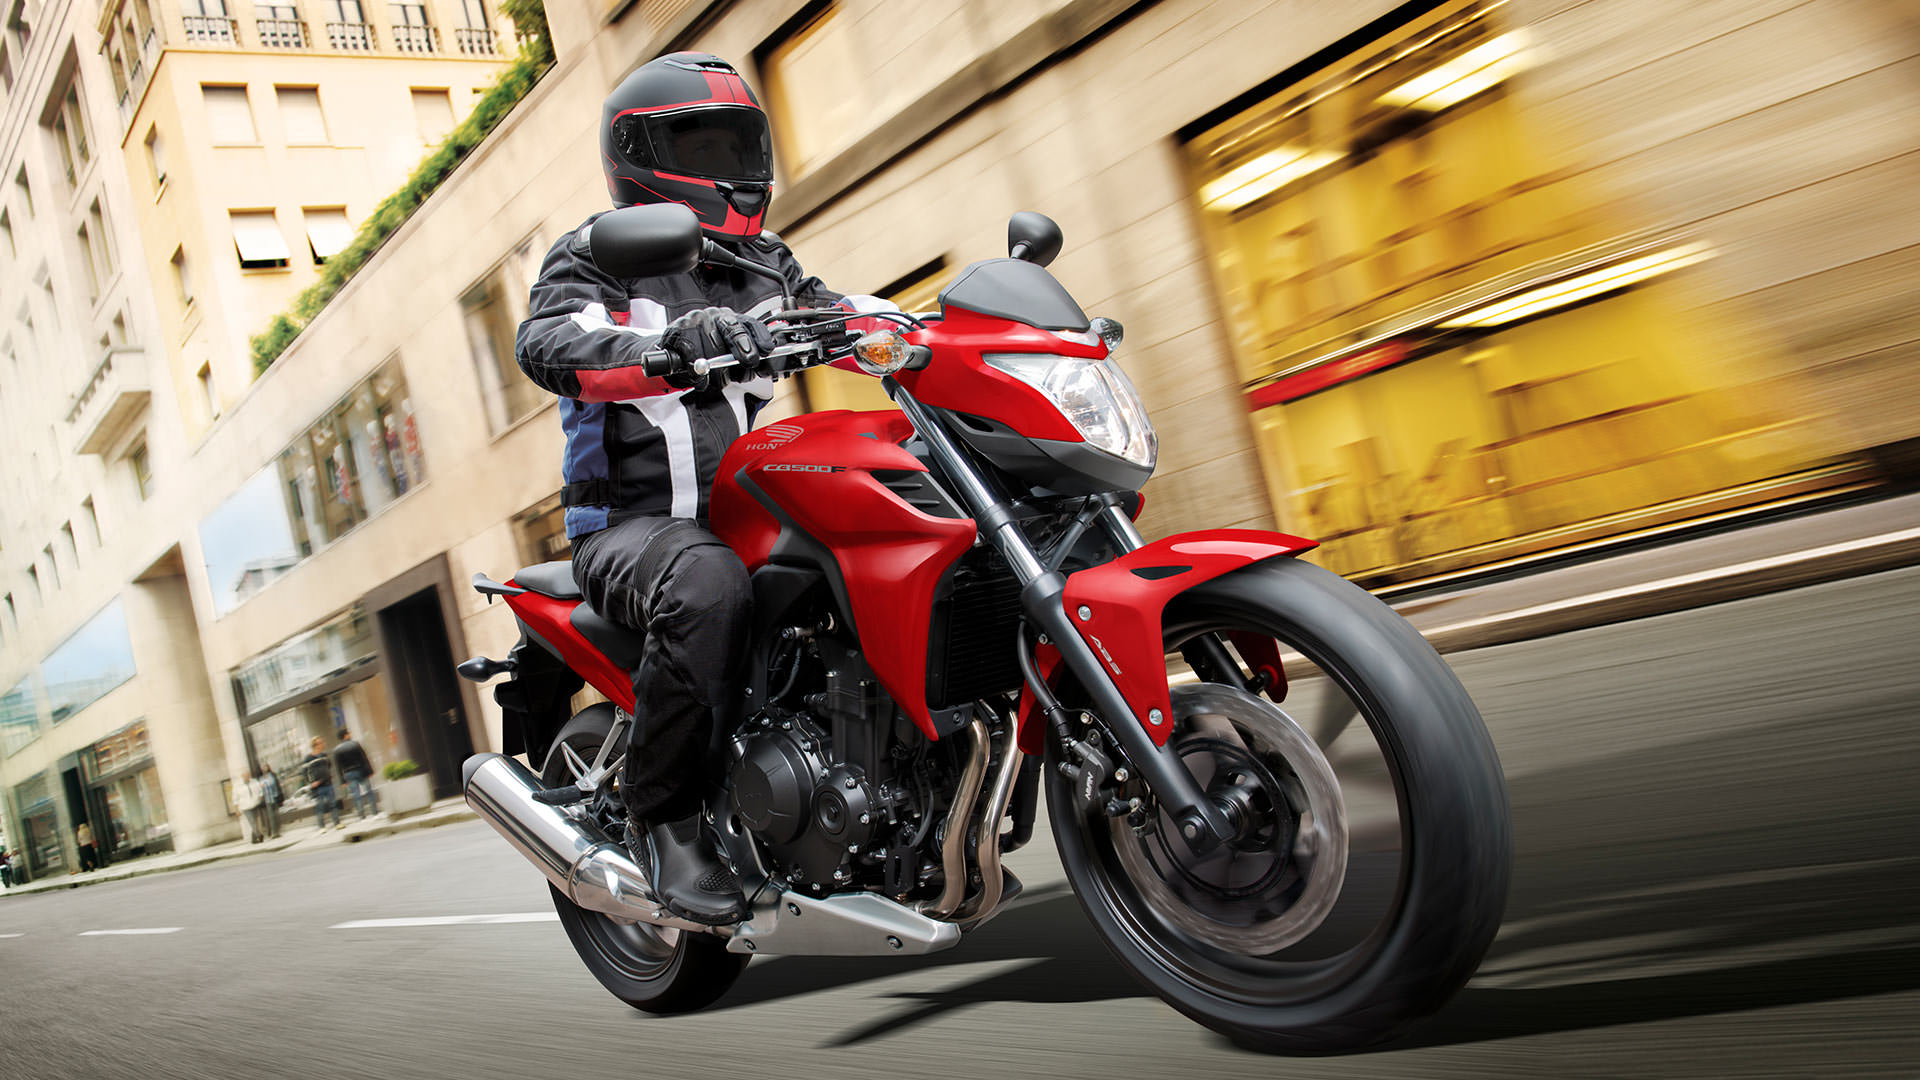 Honda-CB500F-Review-Specs-Naked-CBR-Sport-Bike-StreetFighter-Motorcycle-Horsepower-Torque-MPG-Price